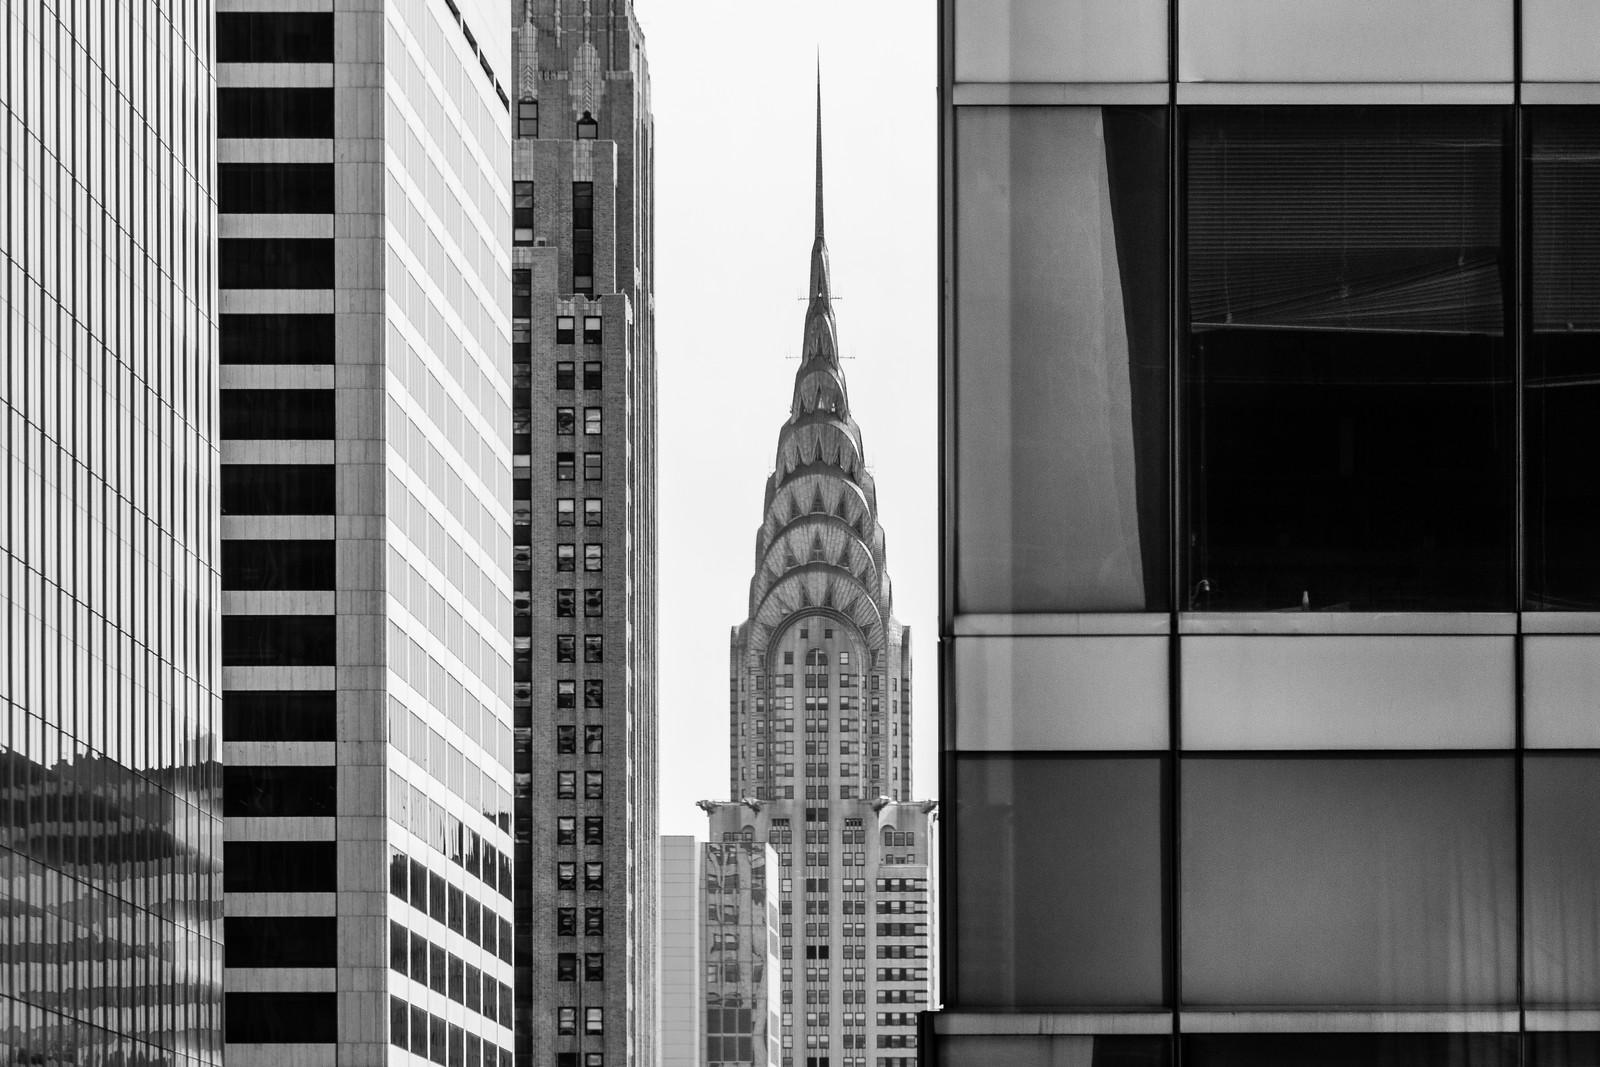 The Chrysler Building